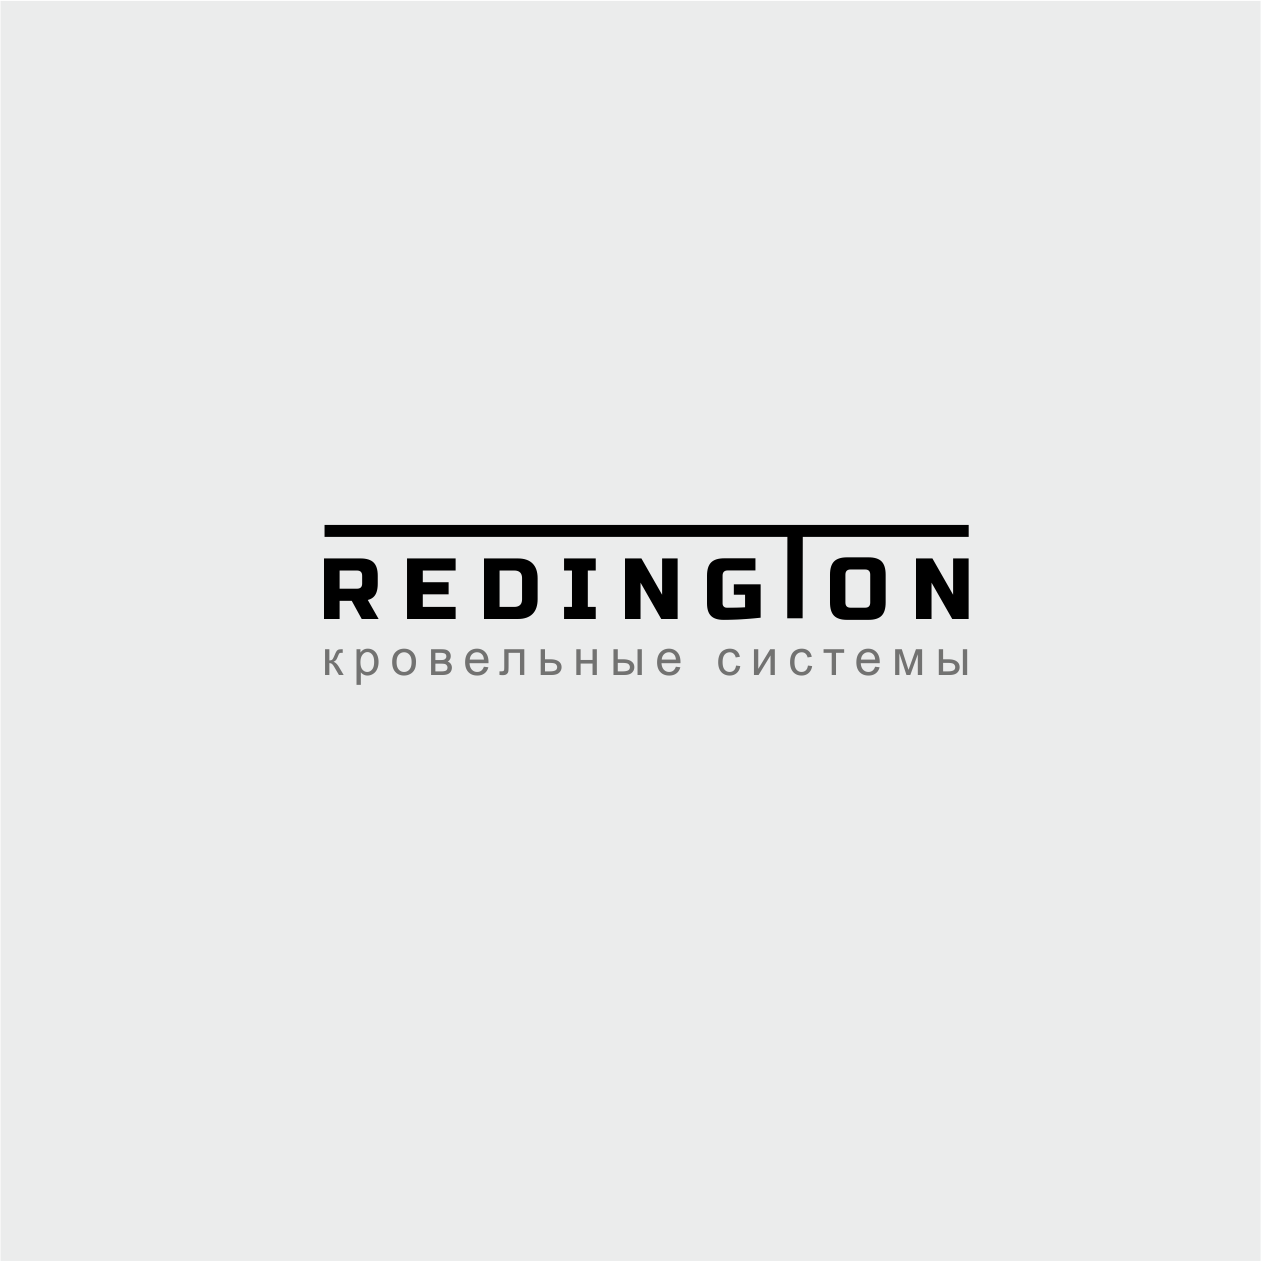 Создание логотипа для компании Redington фото f_28859b4d4b3356c1.png